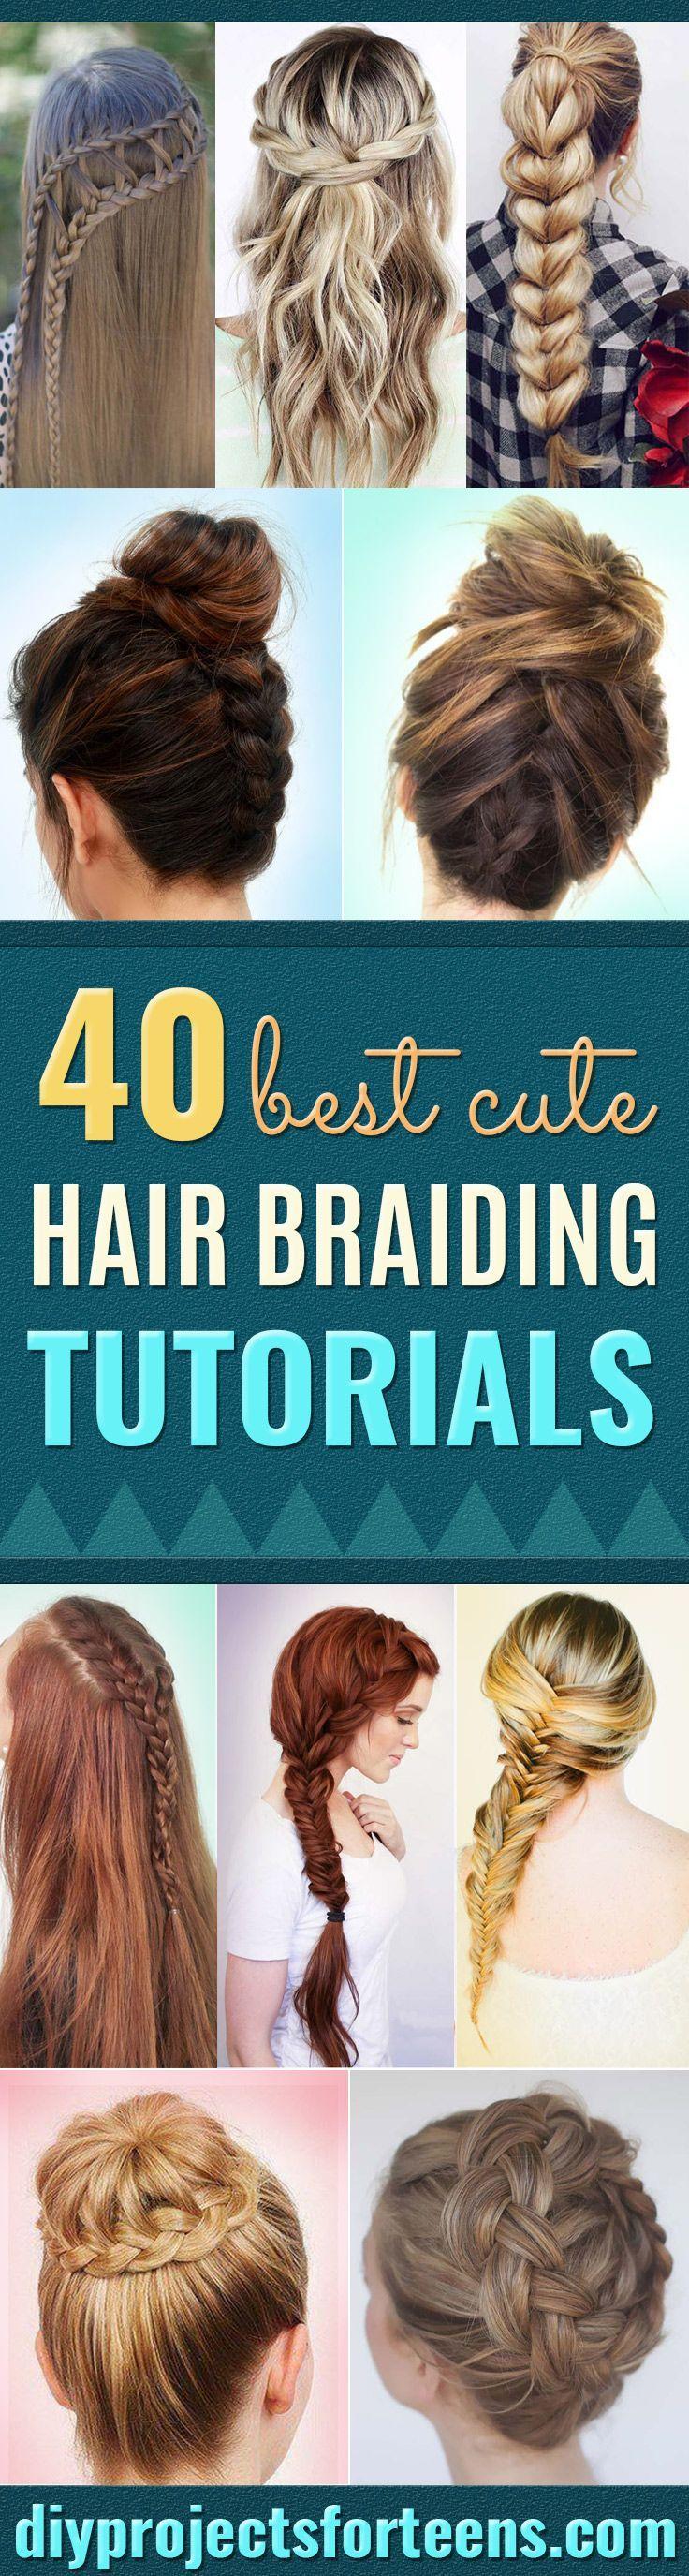 Best hair braiding tutorials easy step by step tutorials for